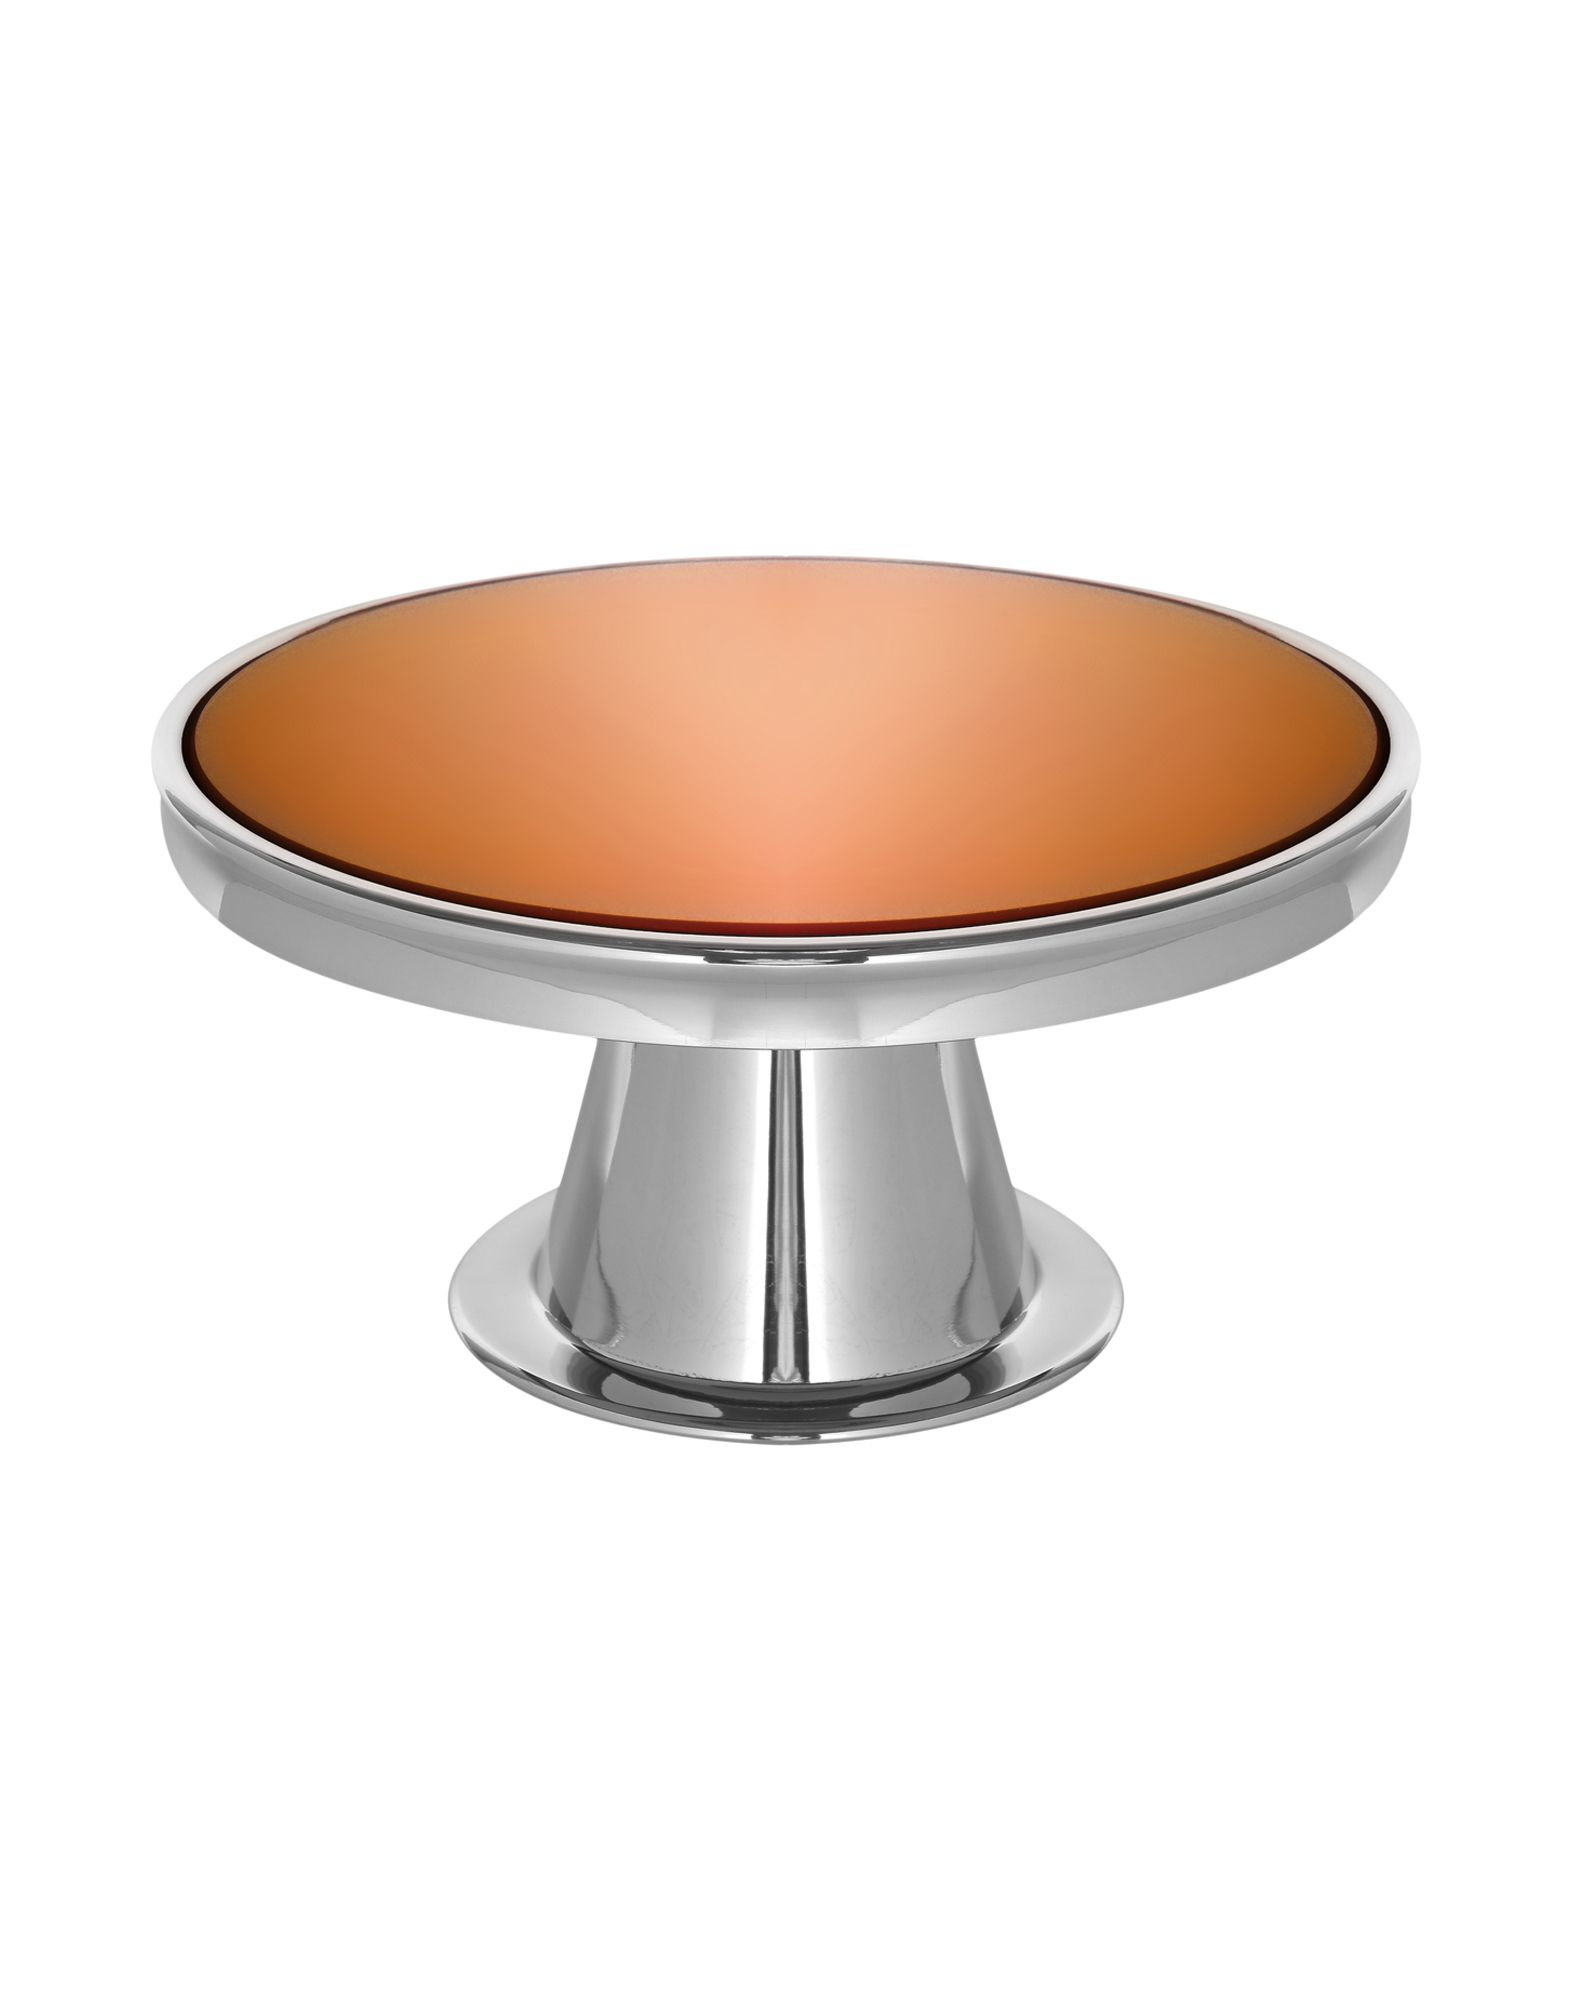 SERAFINO ZANI Unisex Küchenaccessoire Farbe Orange Größe 1